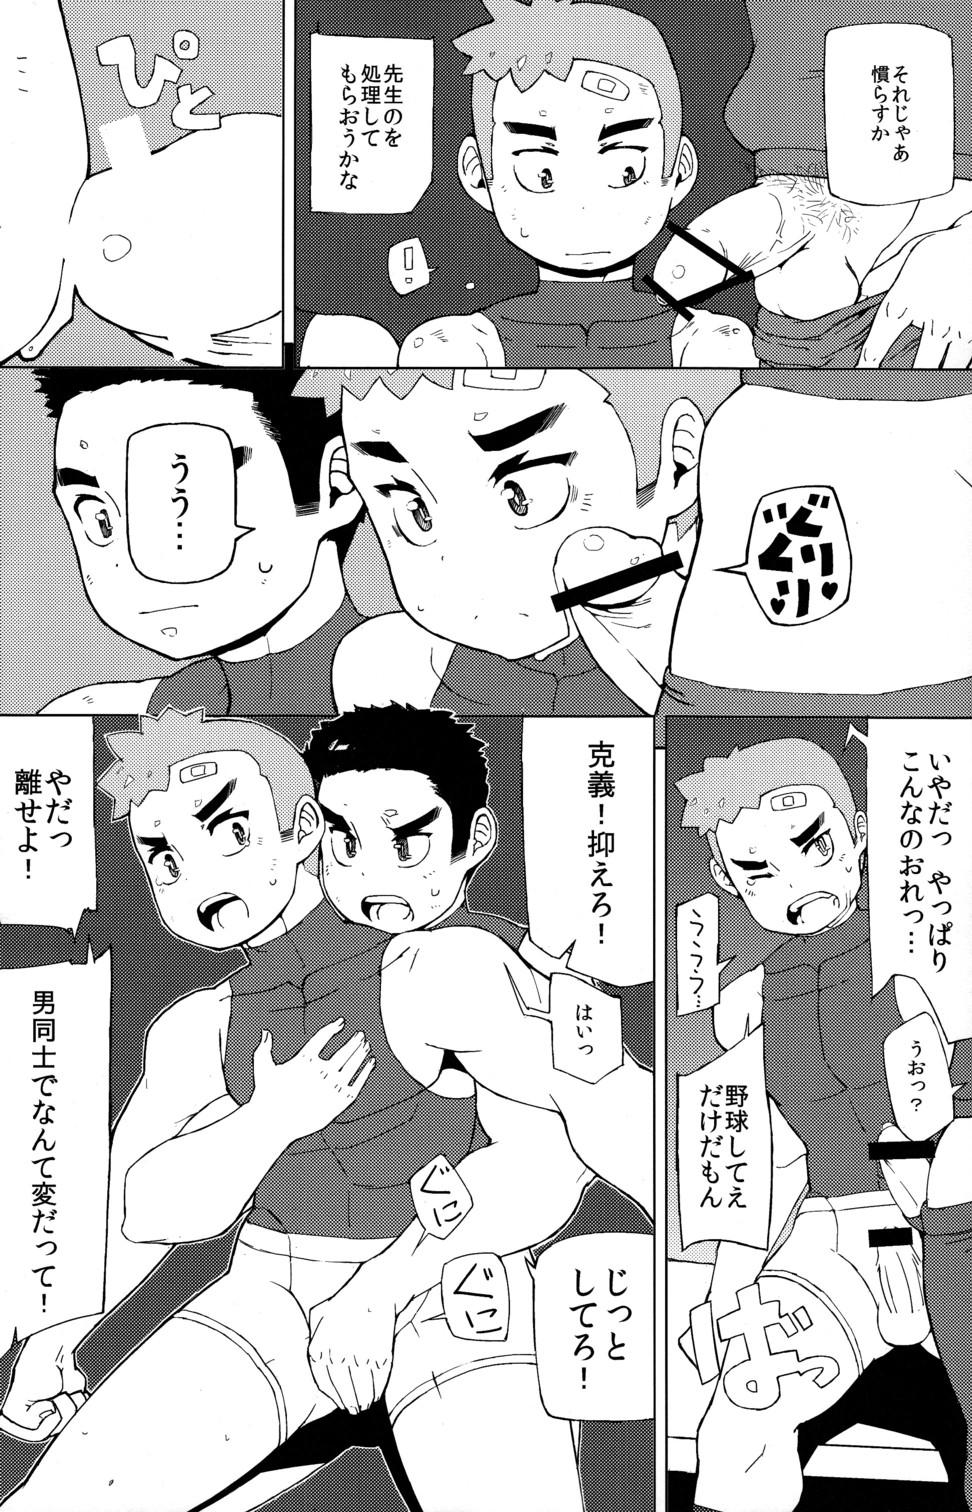 Nikubenki Yakyuubu 4